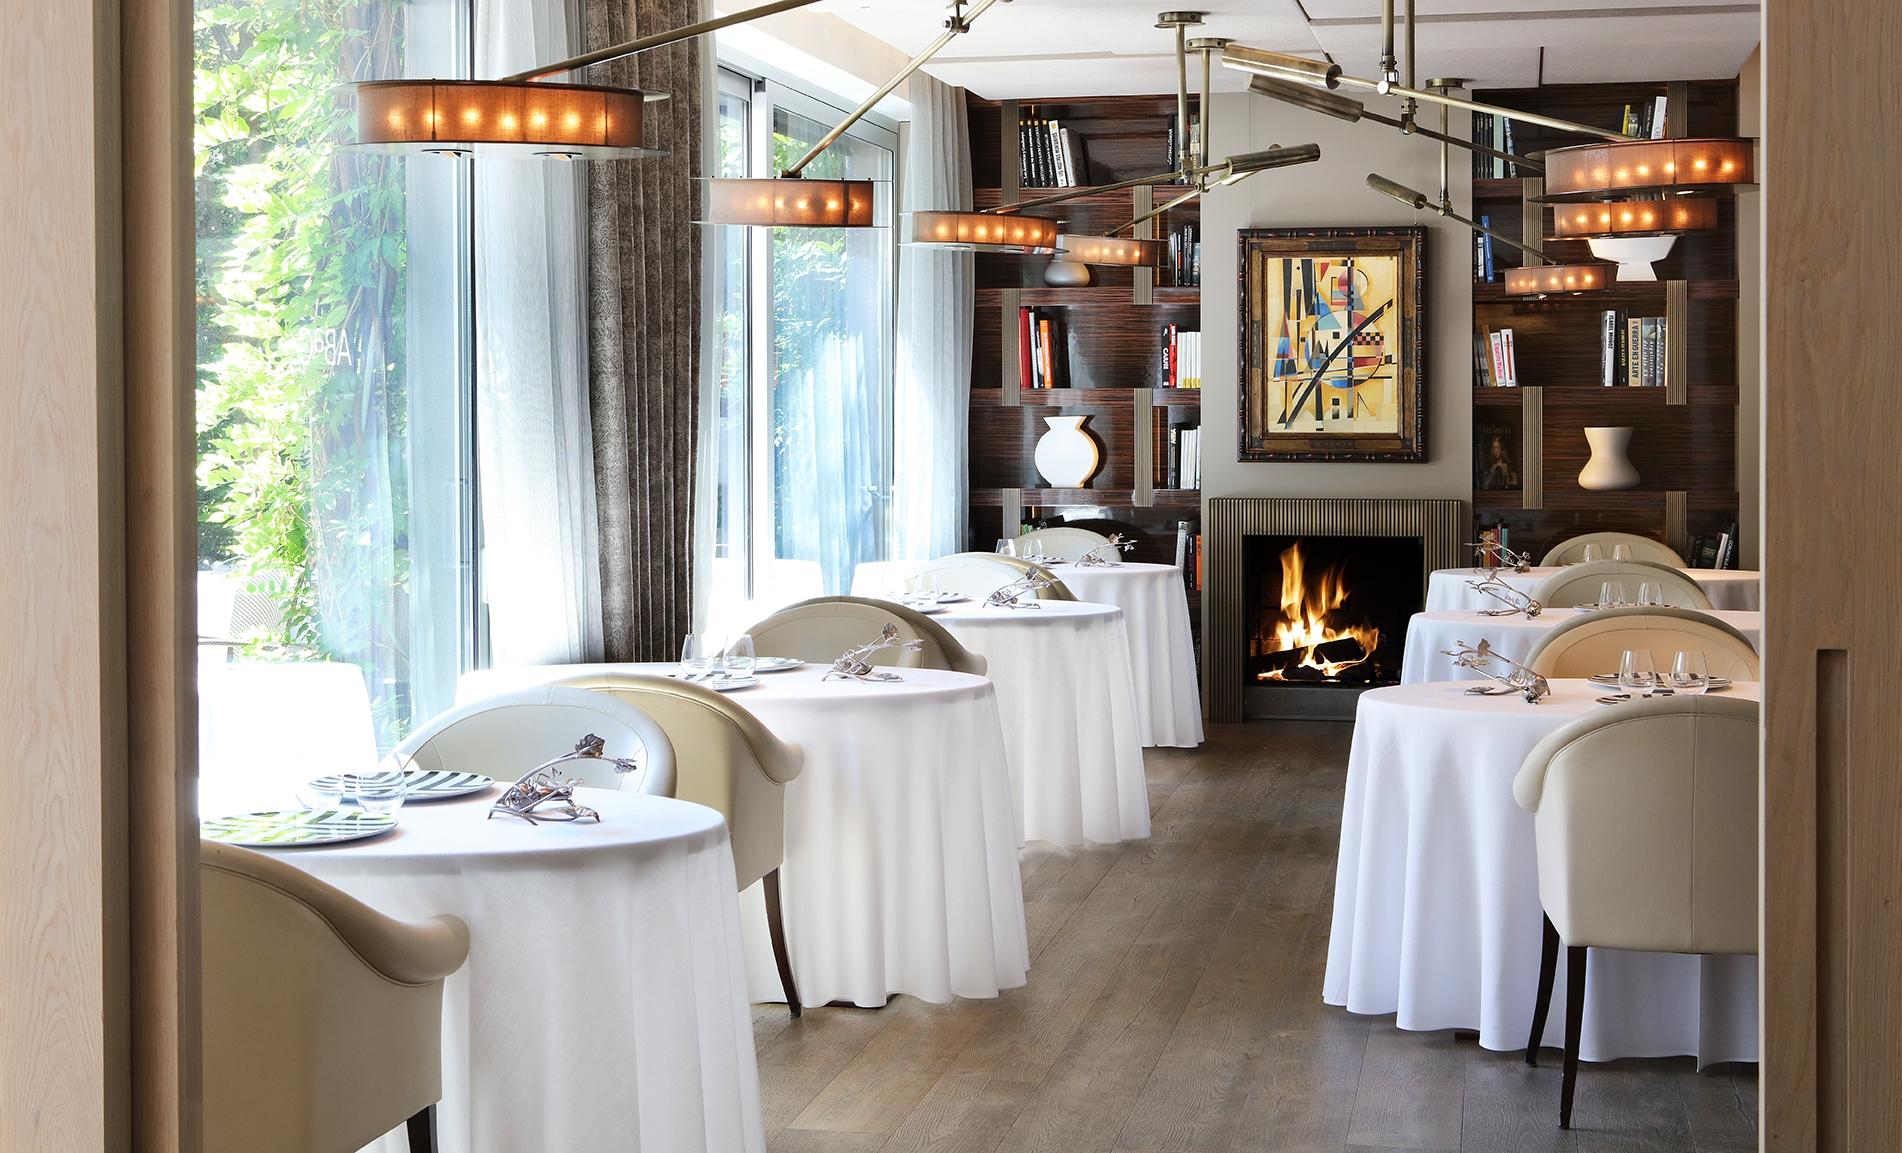 ABaC restaurant © Marco Pastori